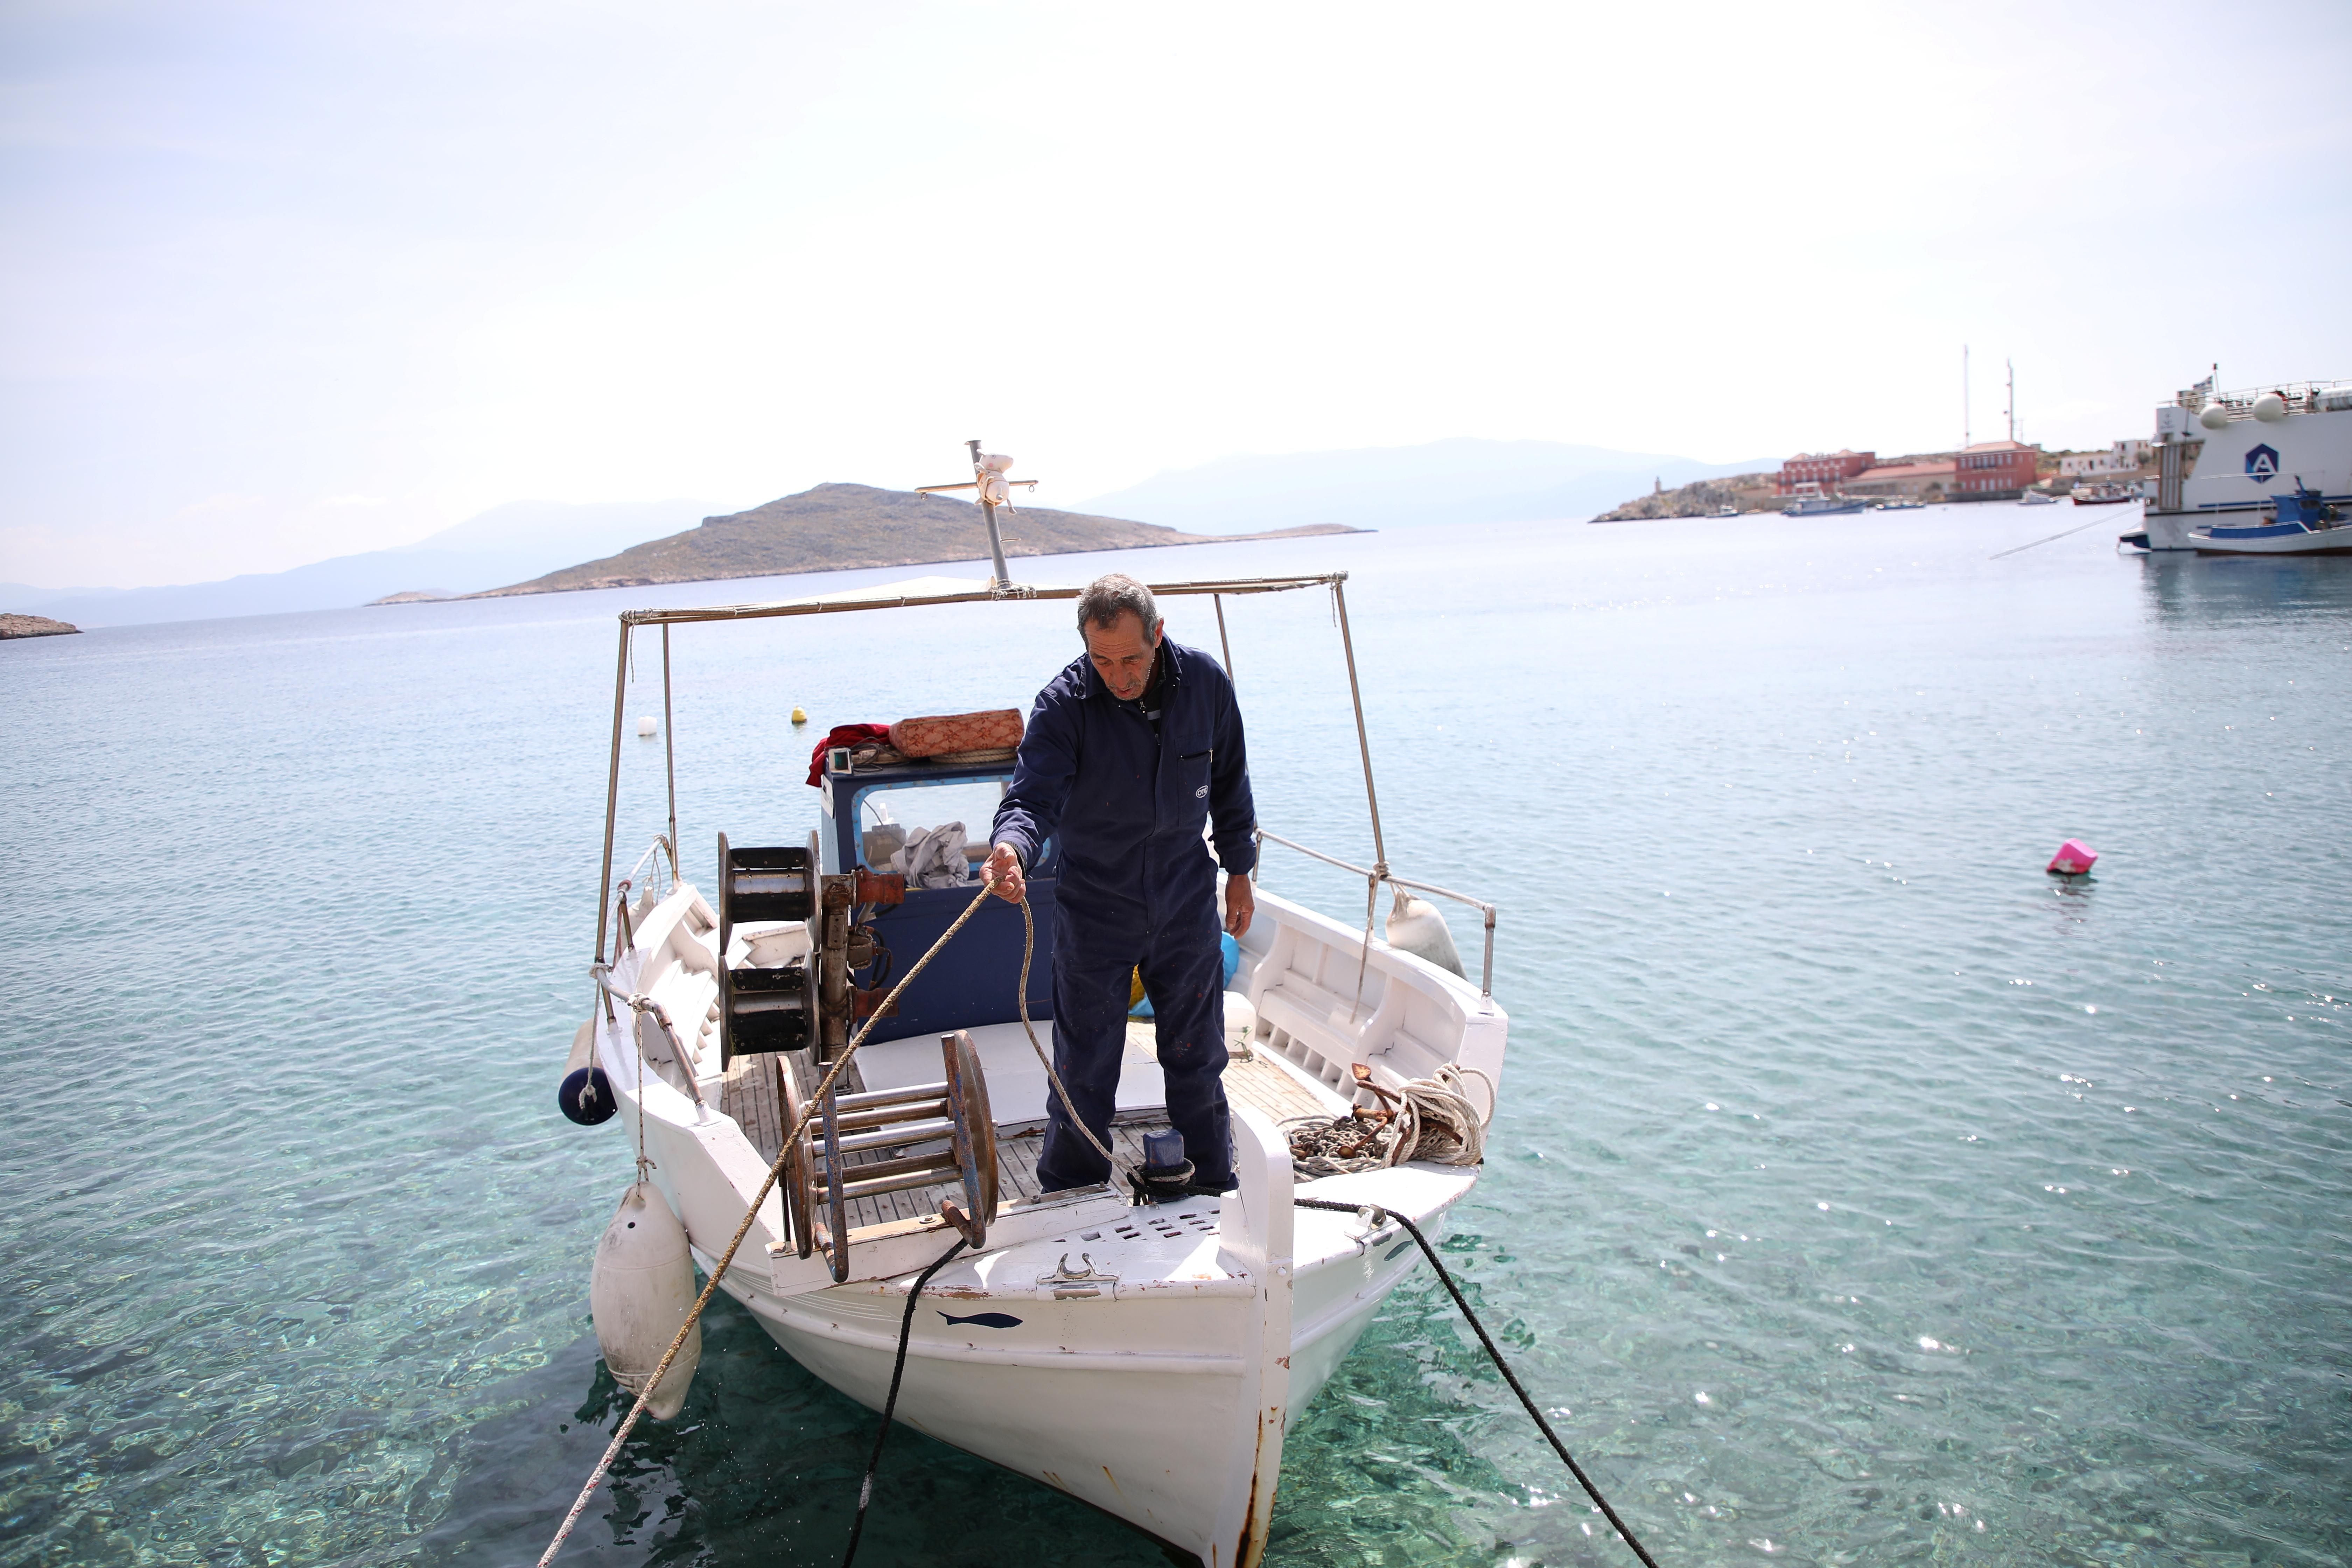 A fisherman prepares to moor his boat at the port, amid the coronavirus disease (COVID-19) pandemic, on the island of Halki, Greece, April 13, 2021. REUTERS/Louiza Vradi